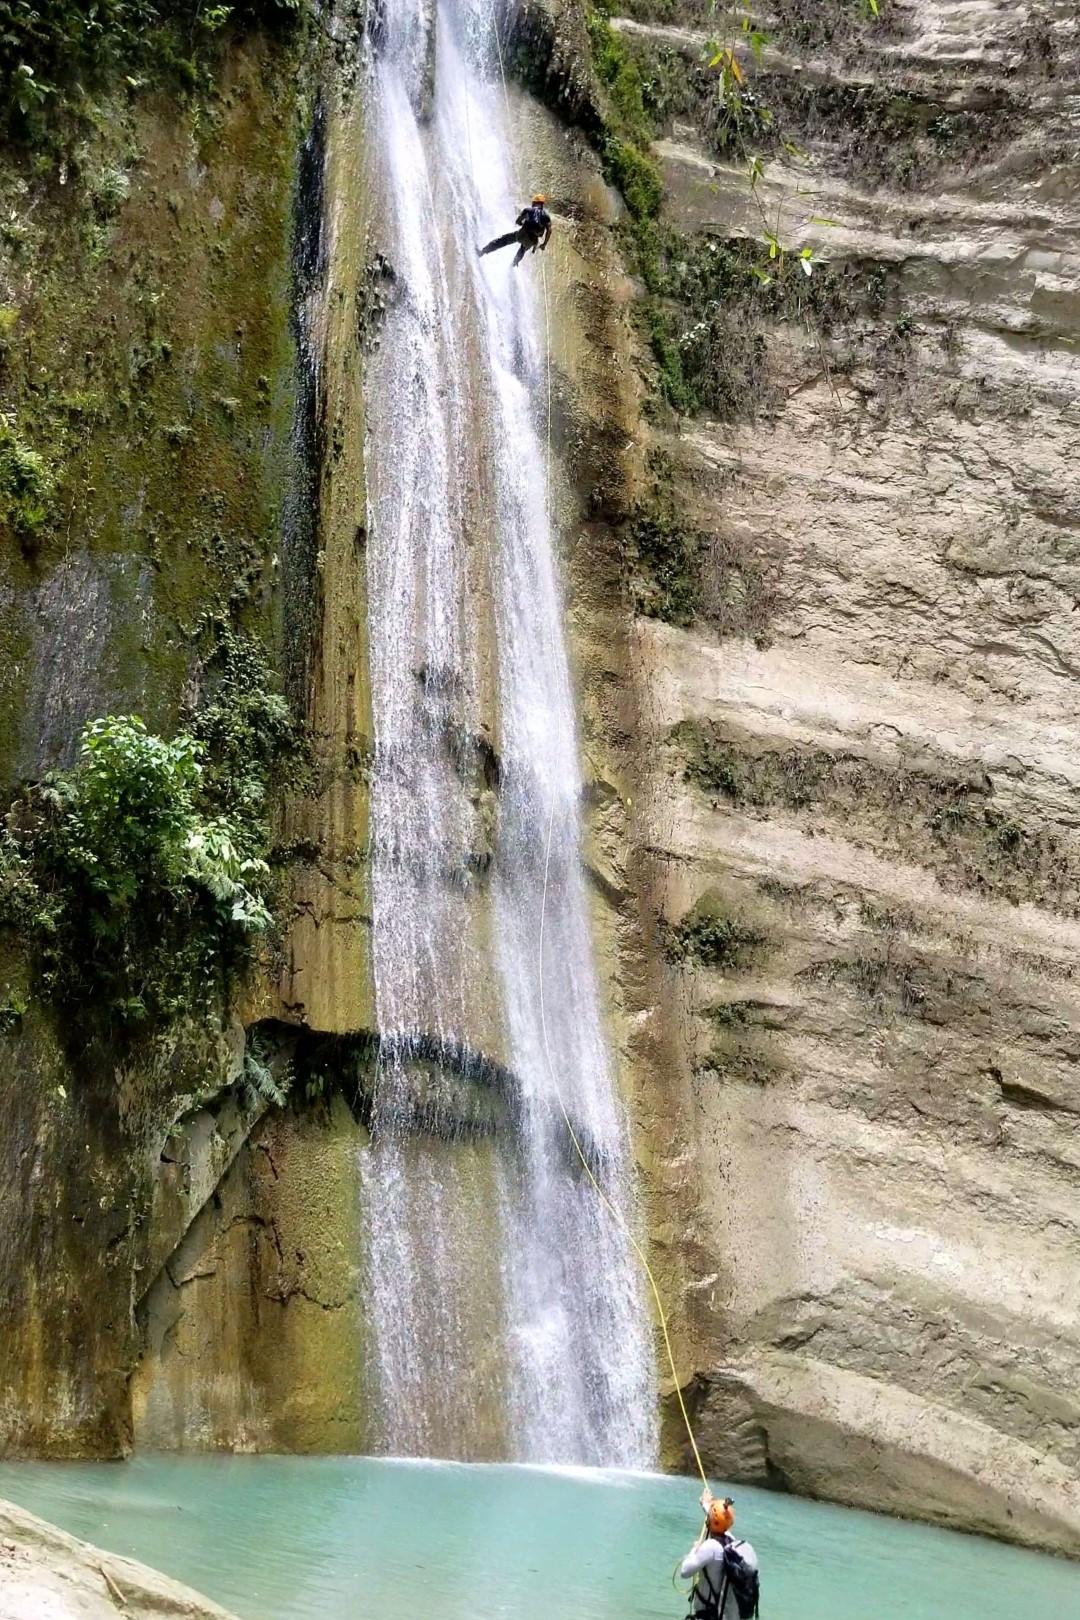 Rappelling Dao Falls 30 meters